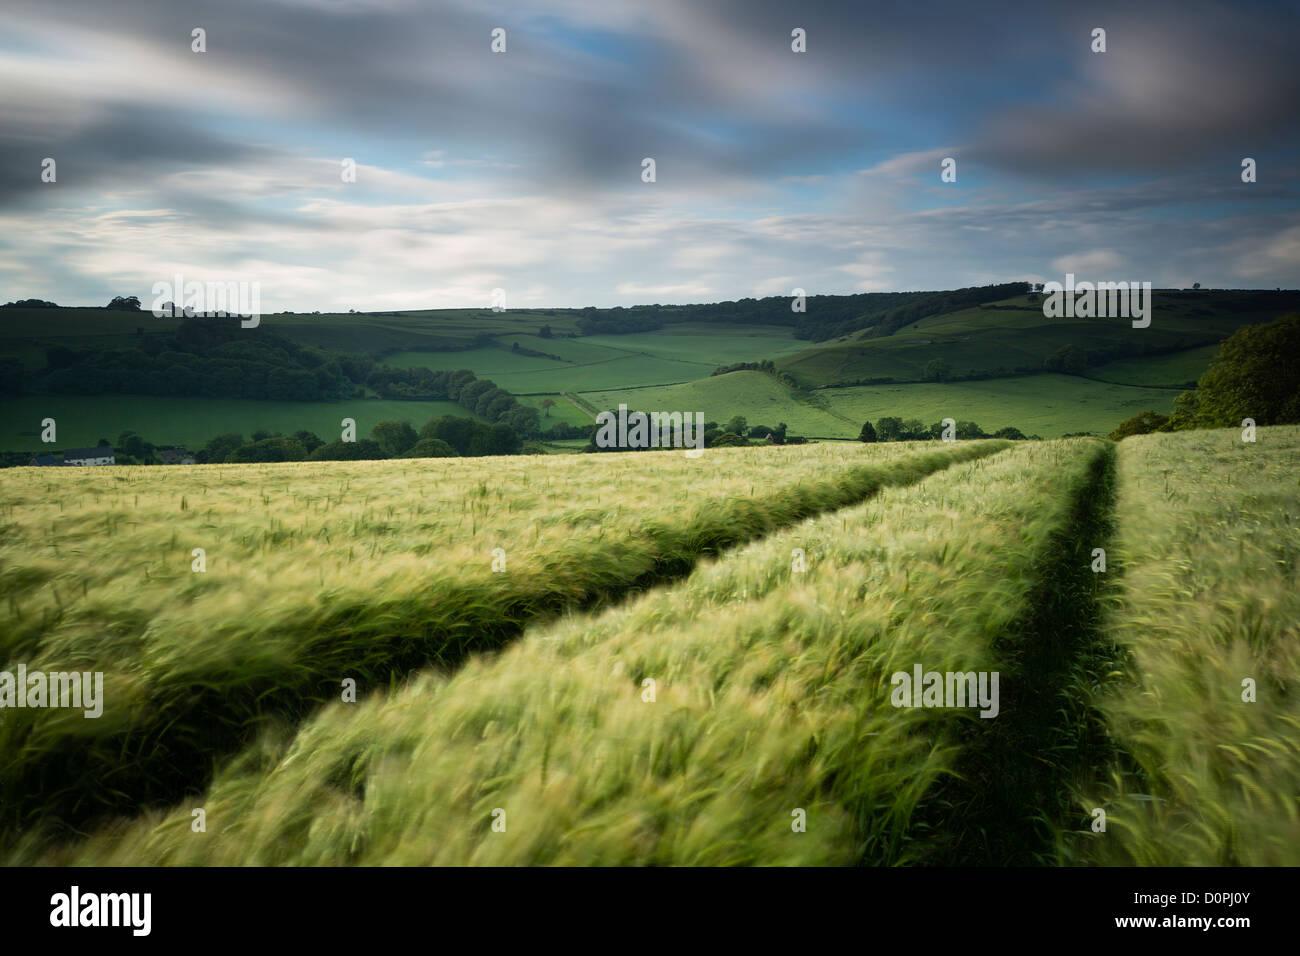 A barley field, nr Plush, Dorset, England, UK - Stock Image